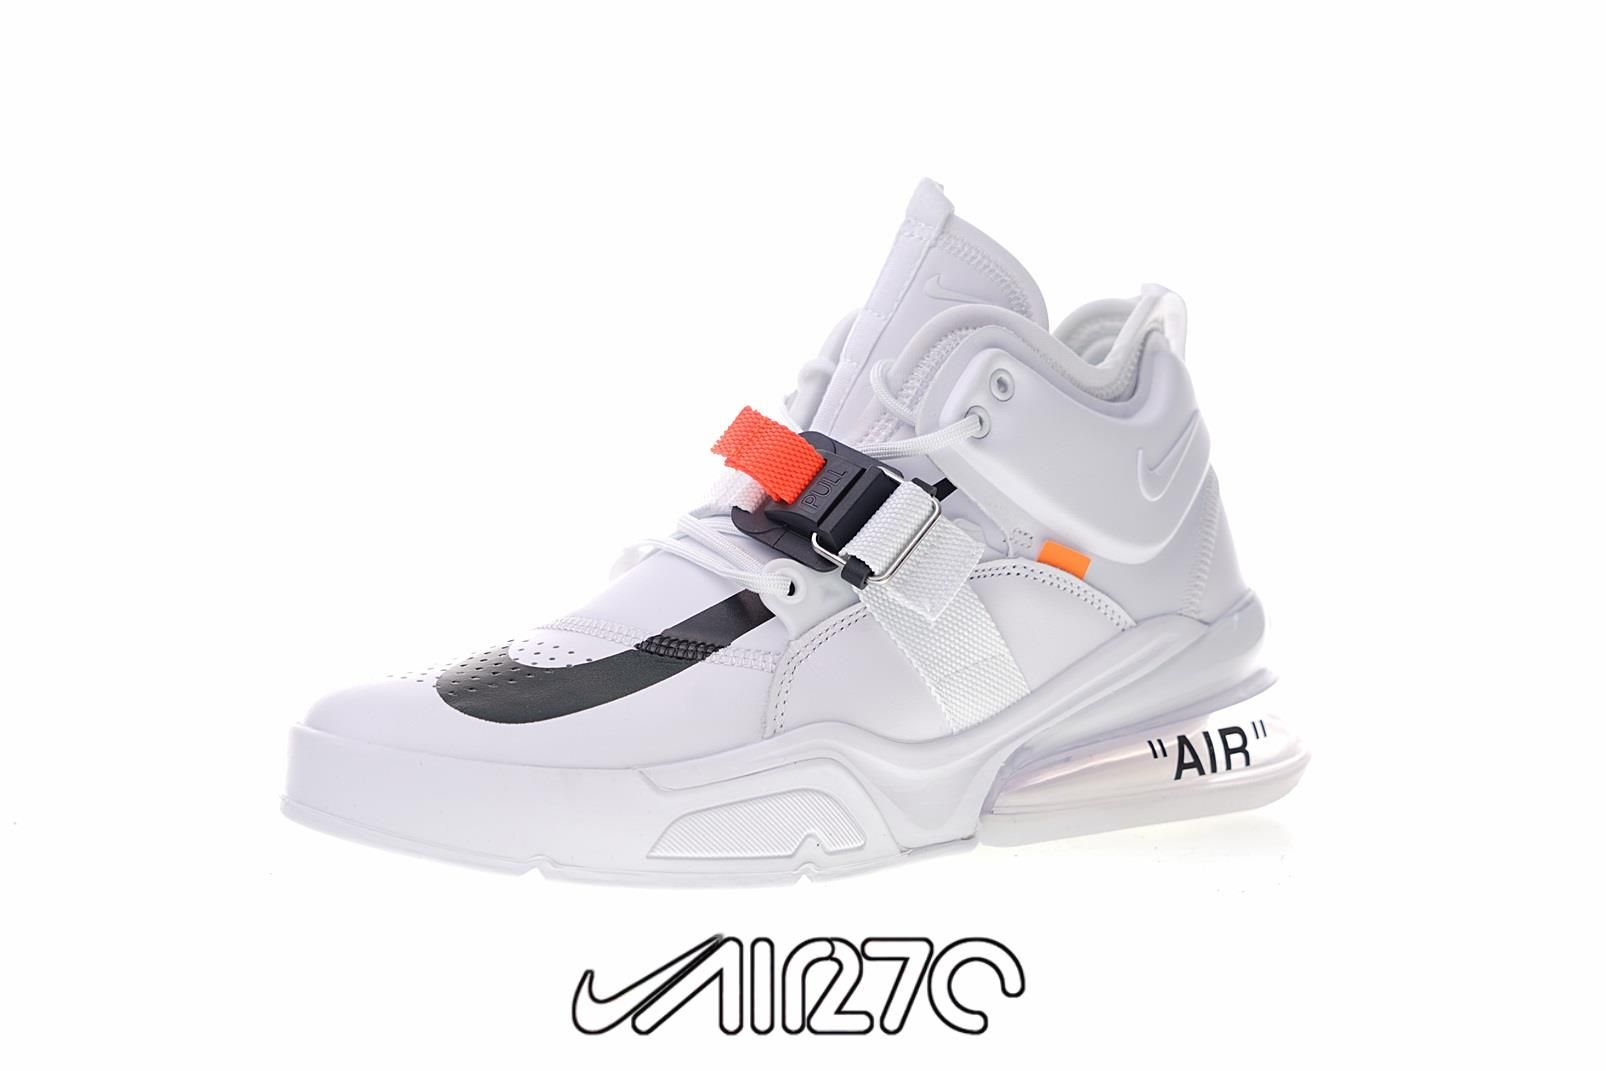 Custom Nike Air Force 270 x Off-White- White Orange-Black White ... dbeb2b873